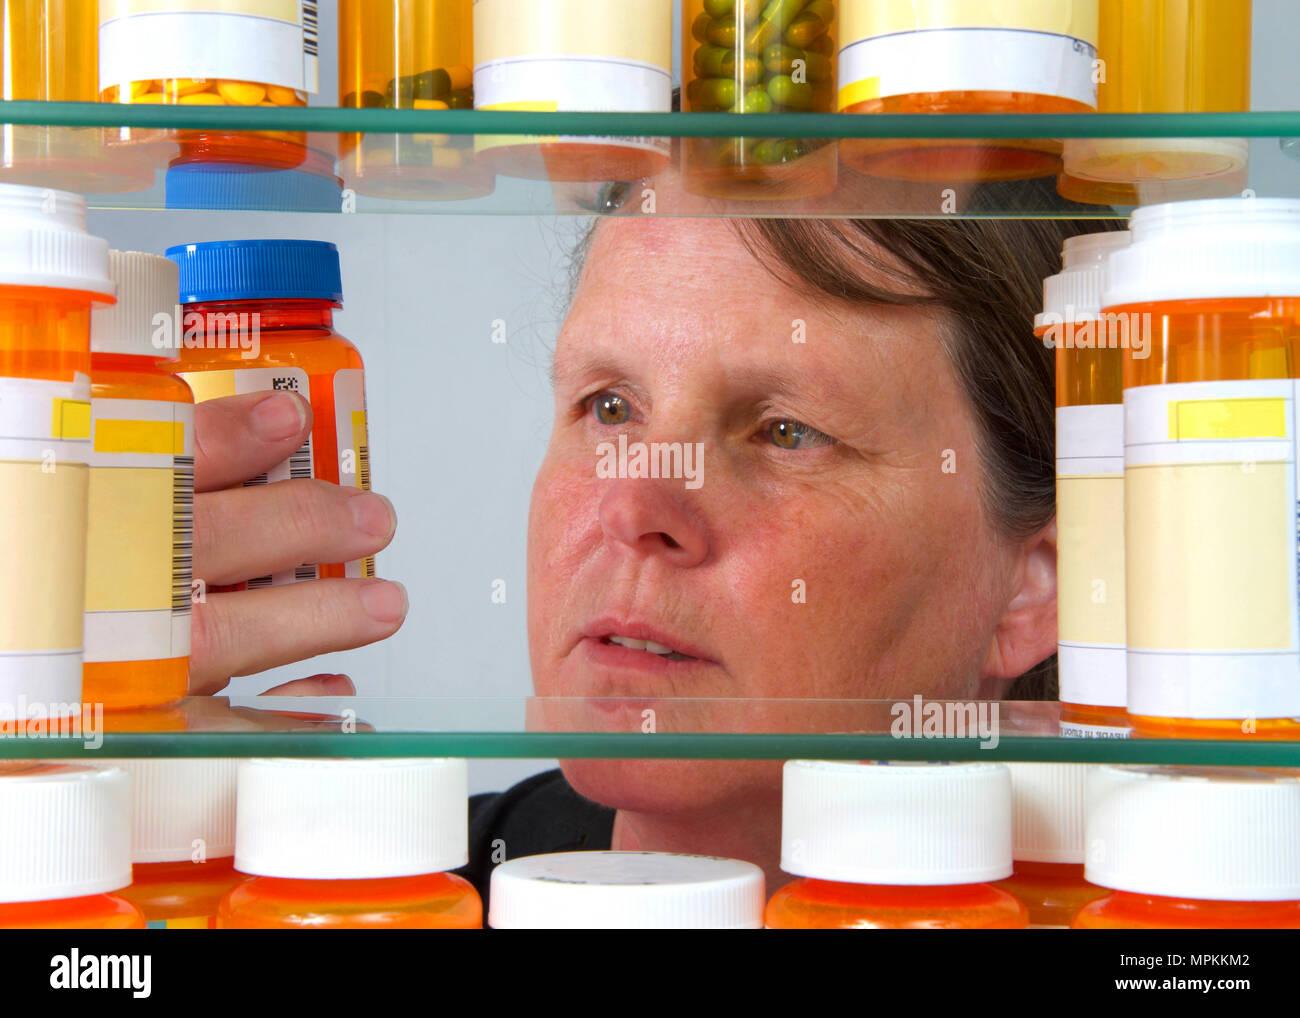 Prescription Label Stock Photos Amp Prescription Label Stock